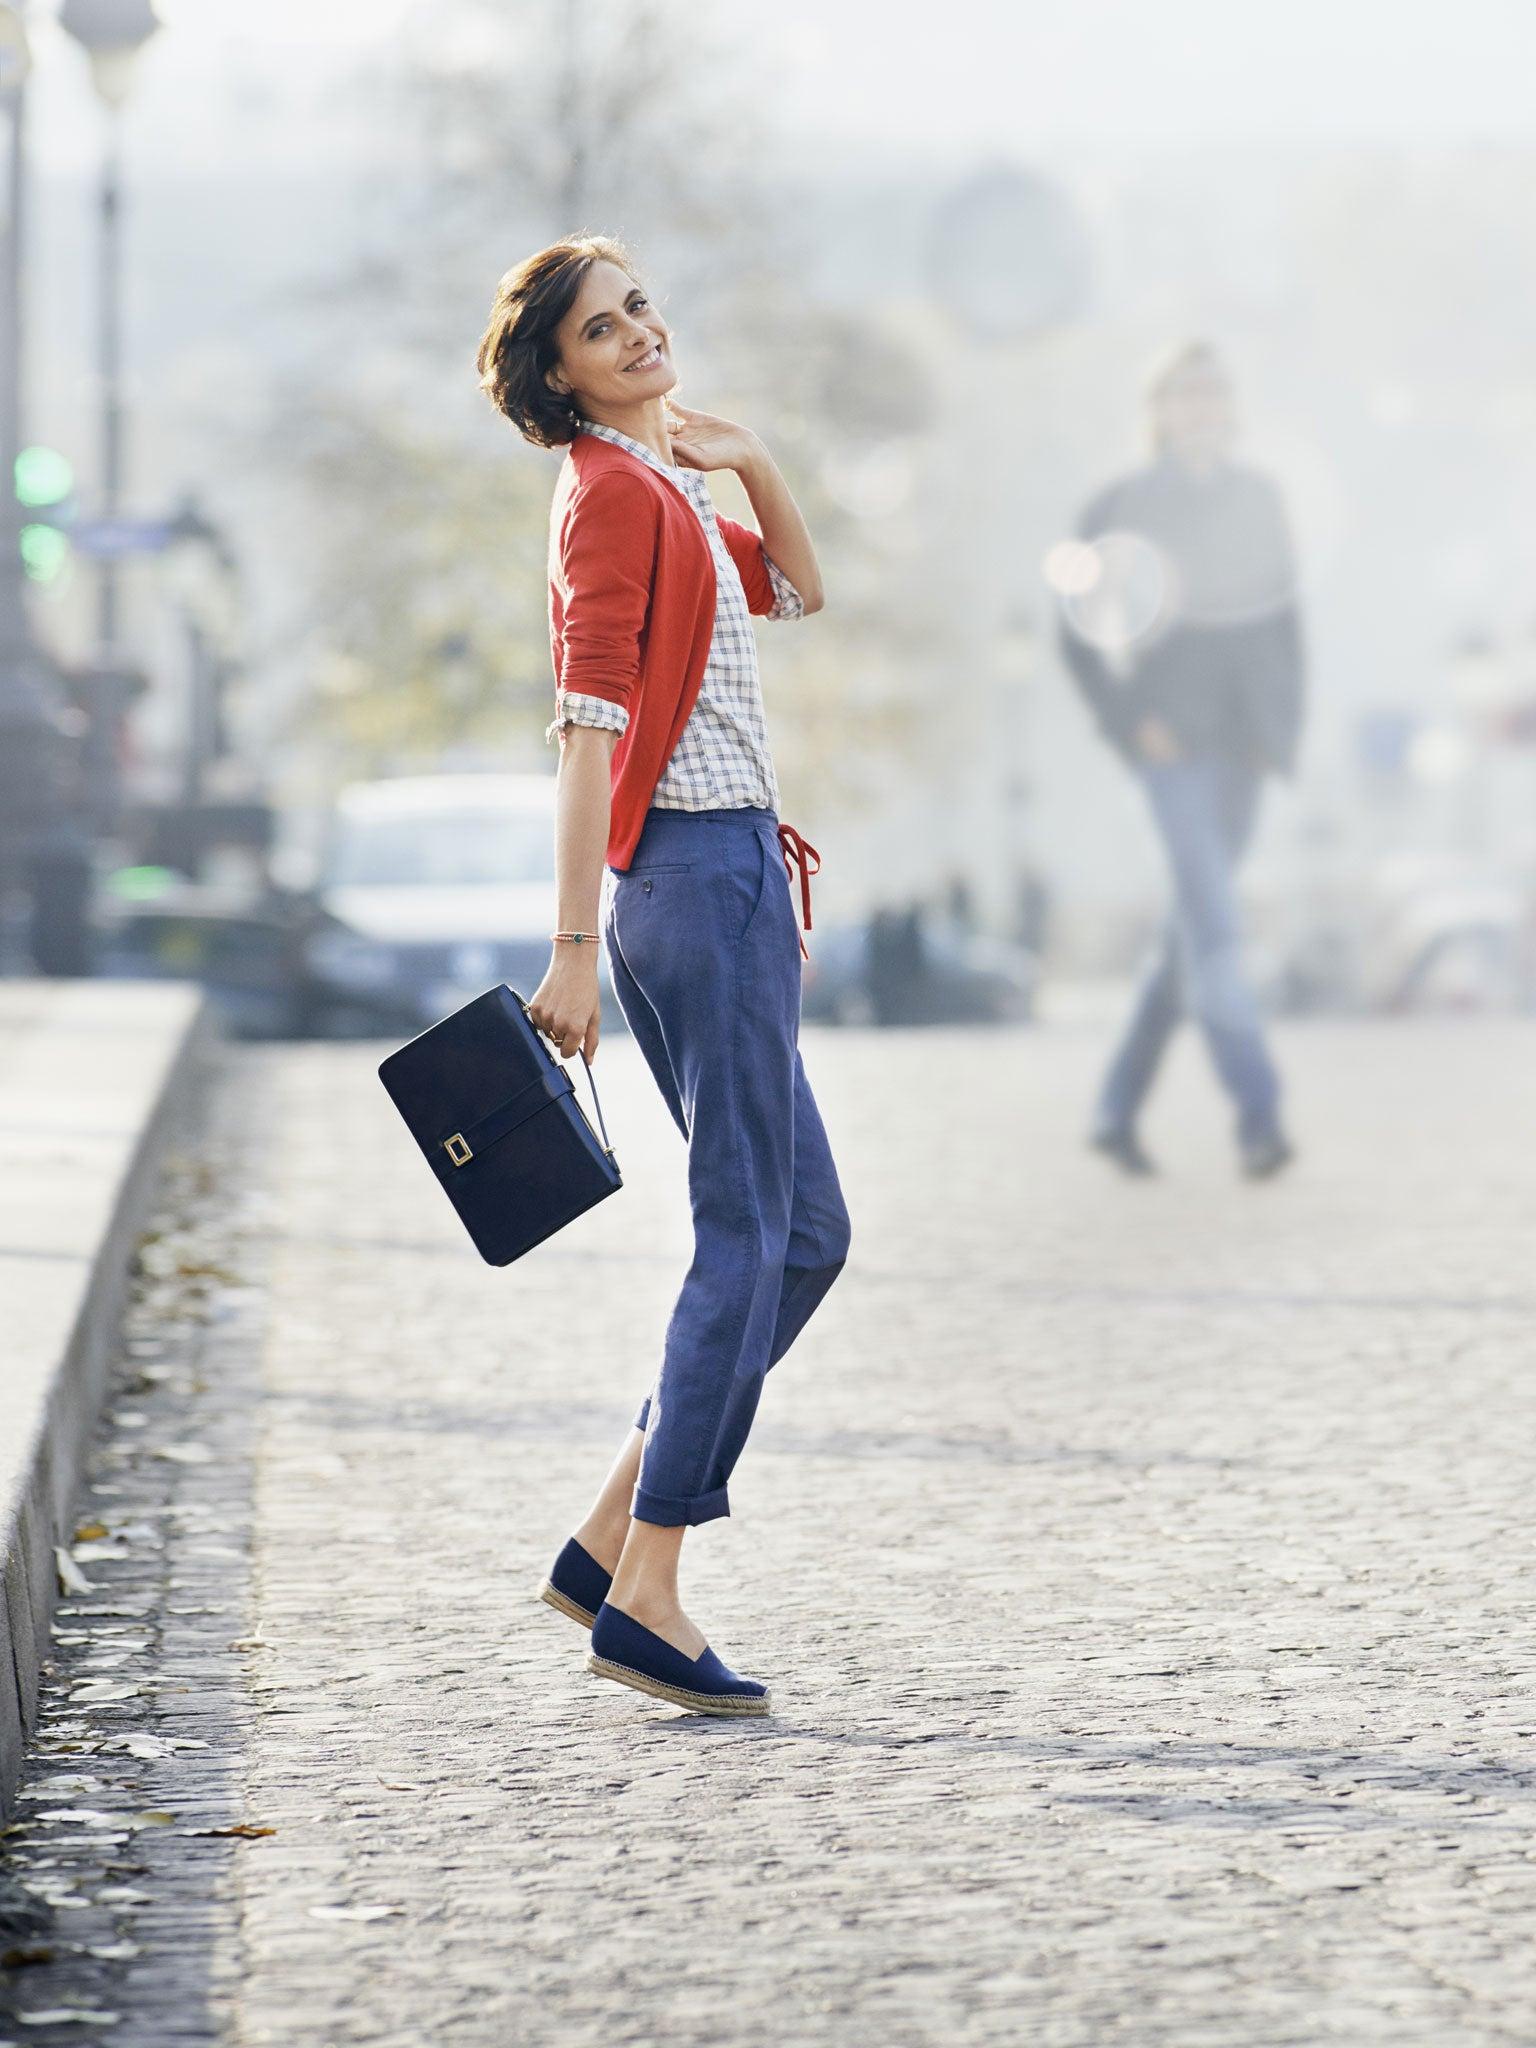 The Fashion Style Wwe